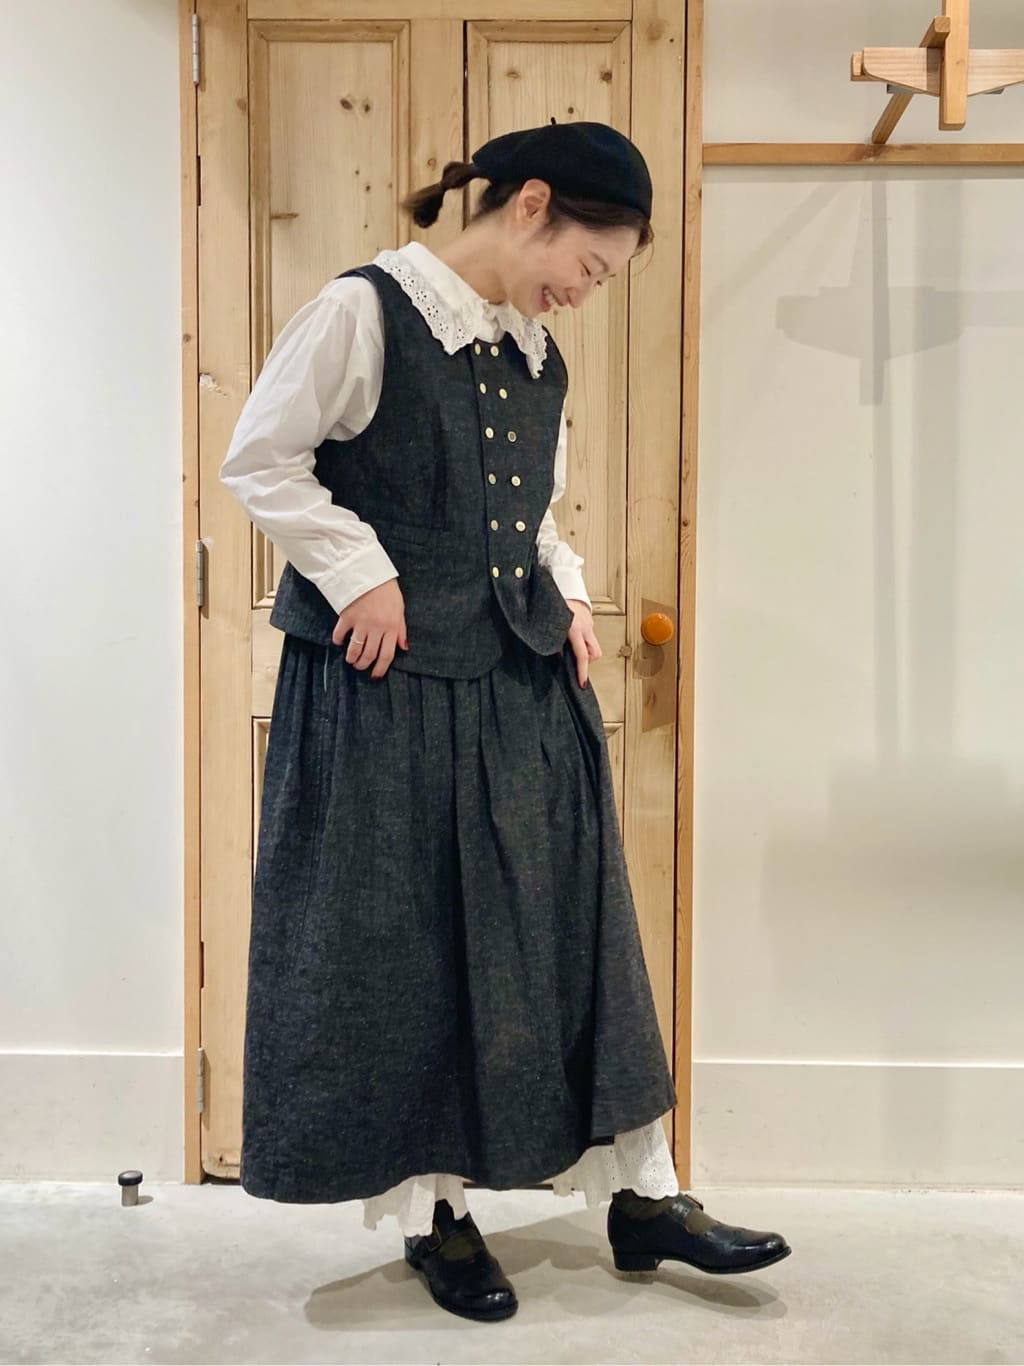 Malle chambre de charme 調布パルコ 身長:162cm 2021.10.23